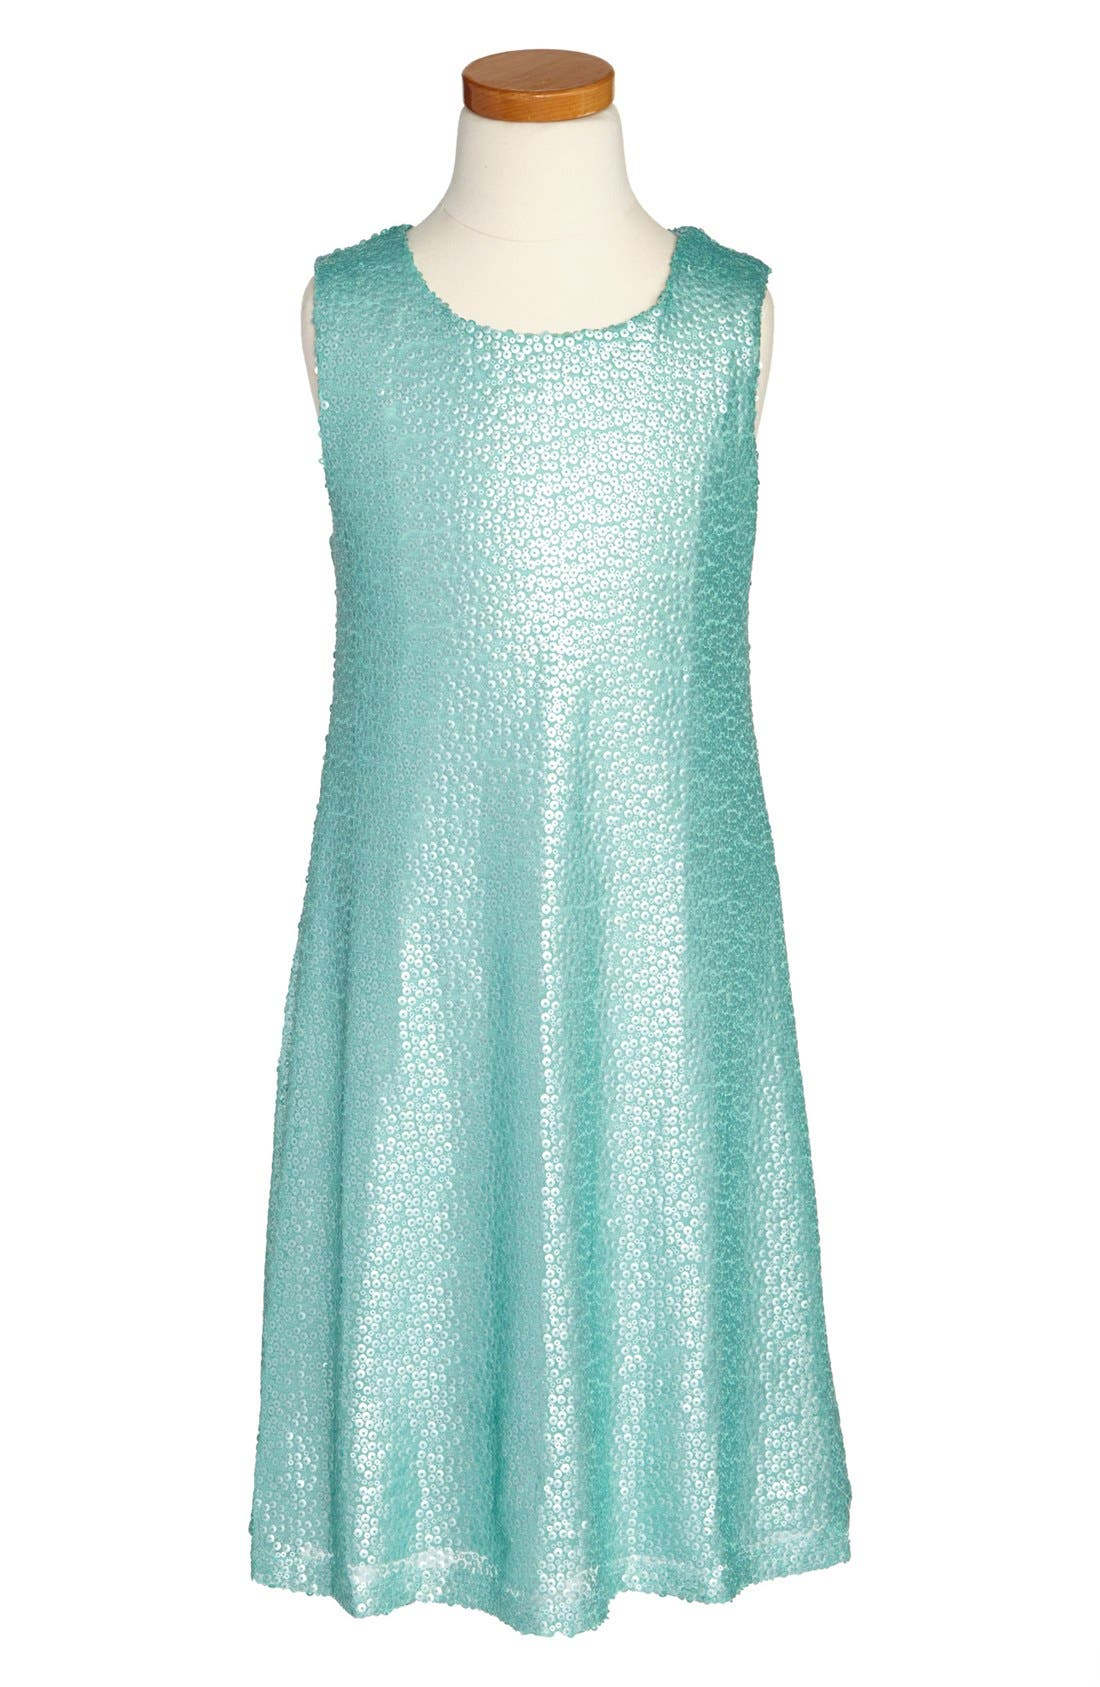 Main Image - Zunie Sequin Tank Dress (Big Girls)